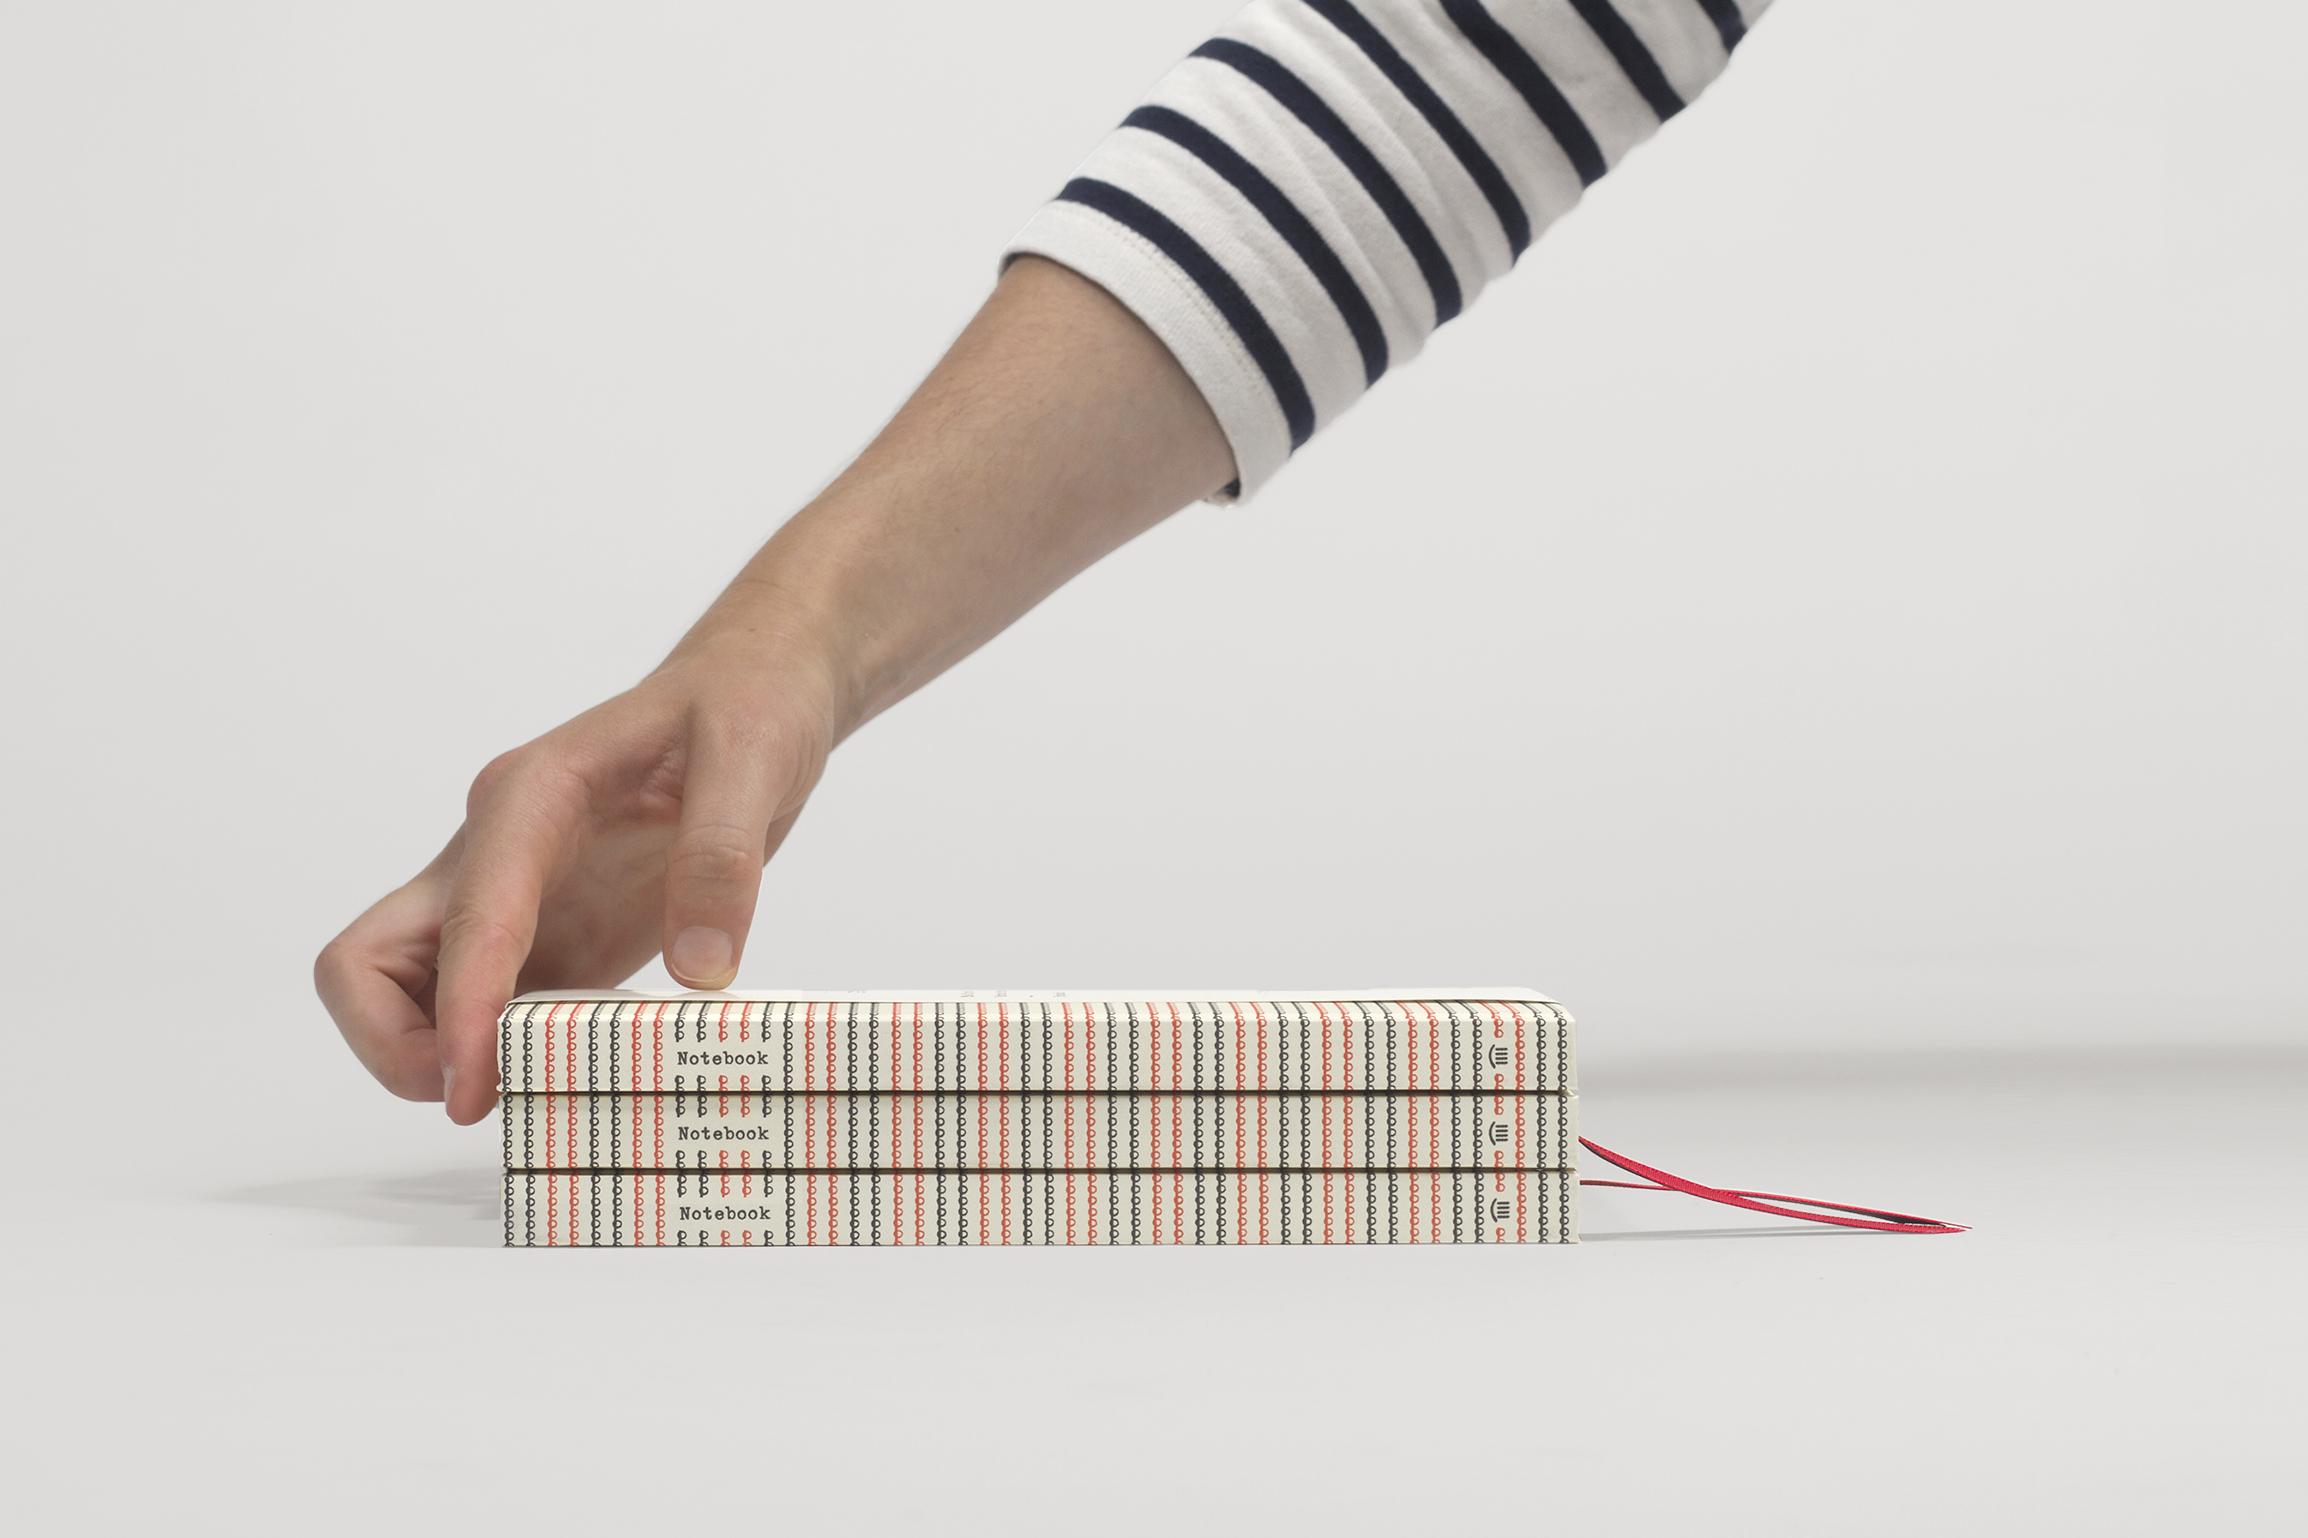 olivetti notebook 1